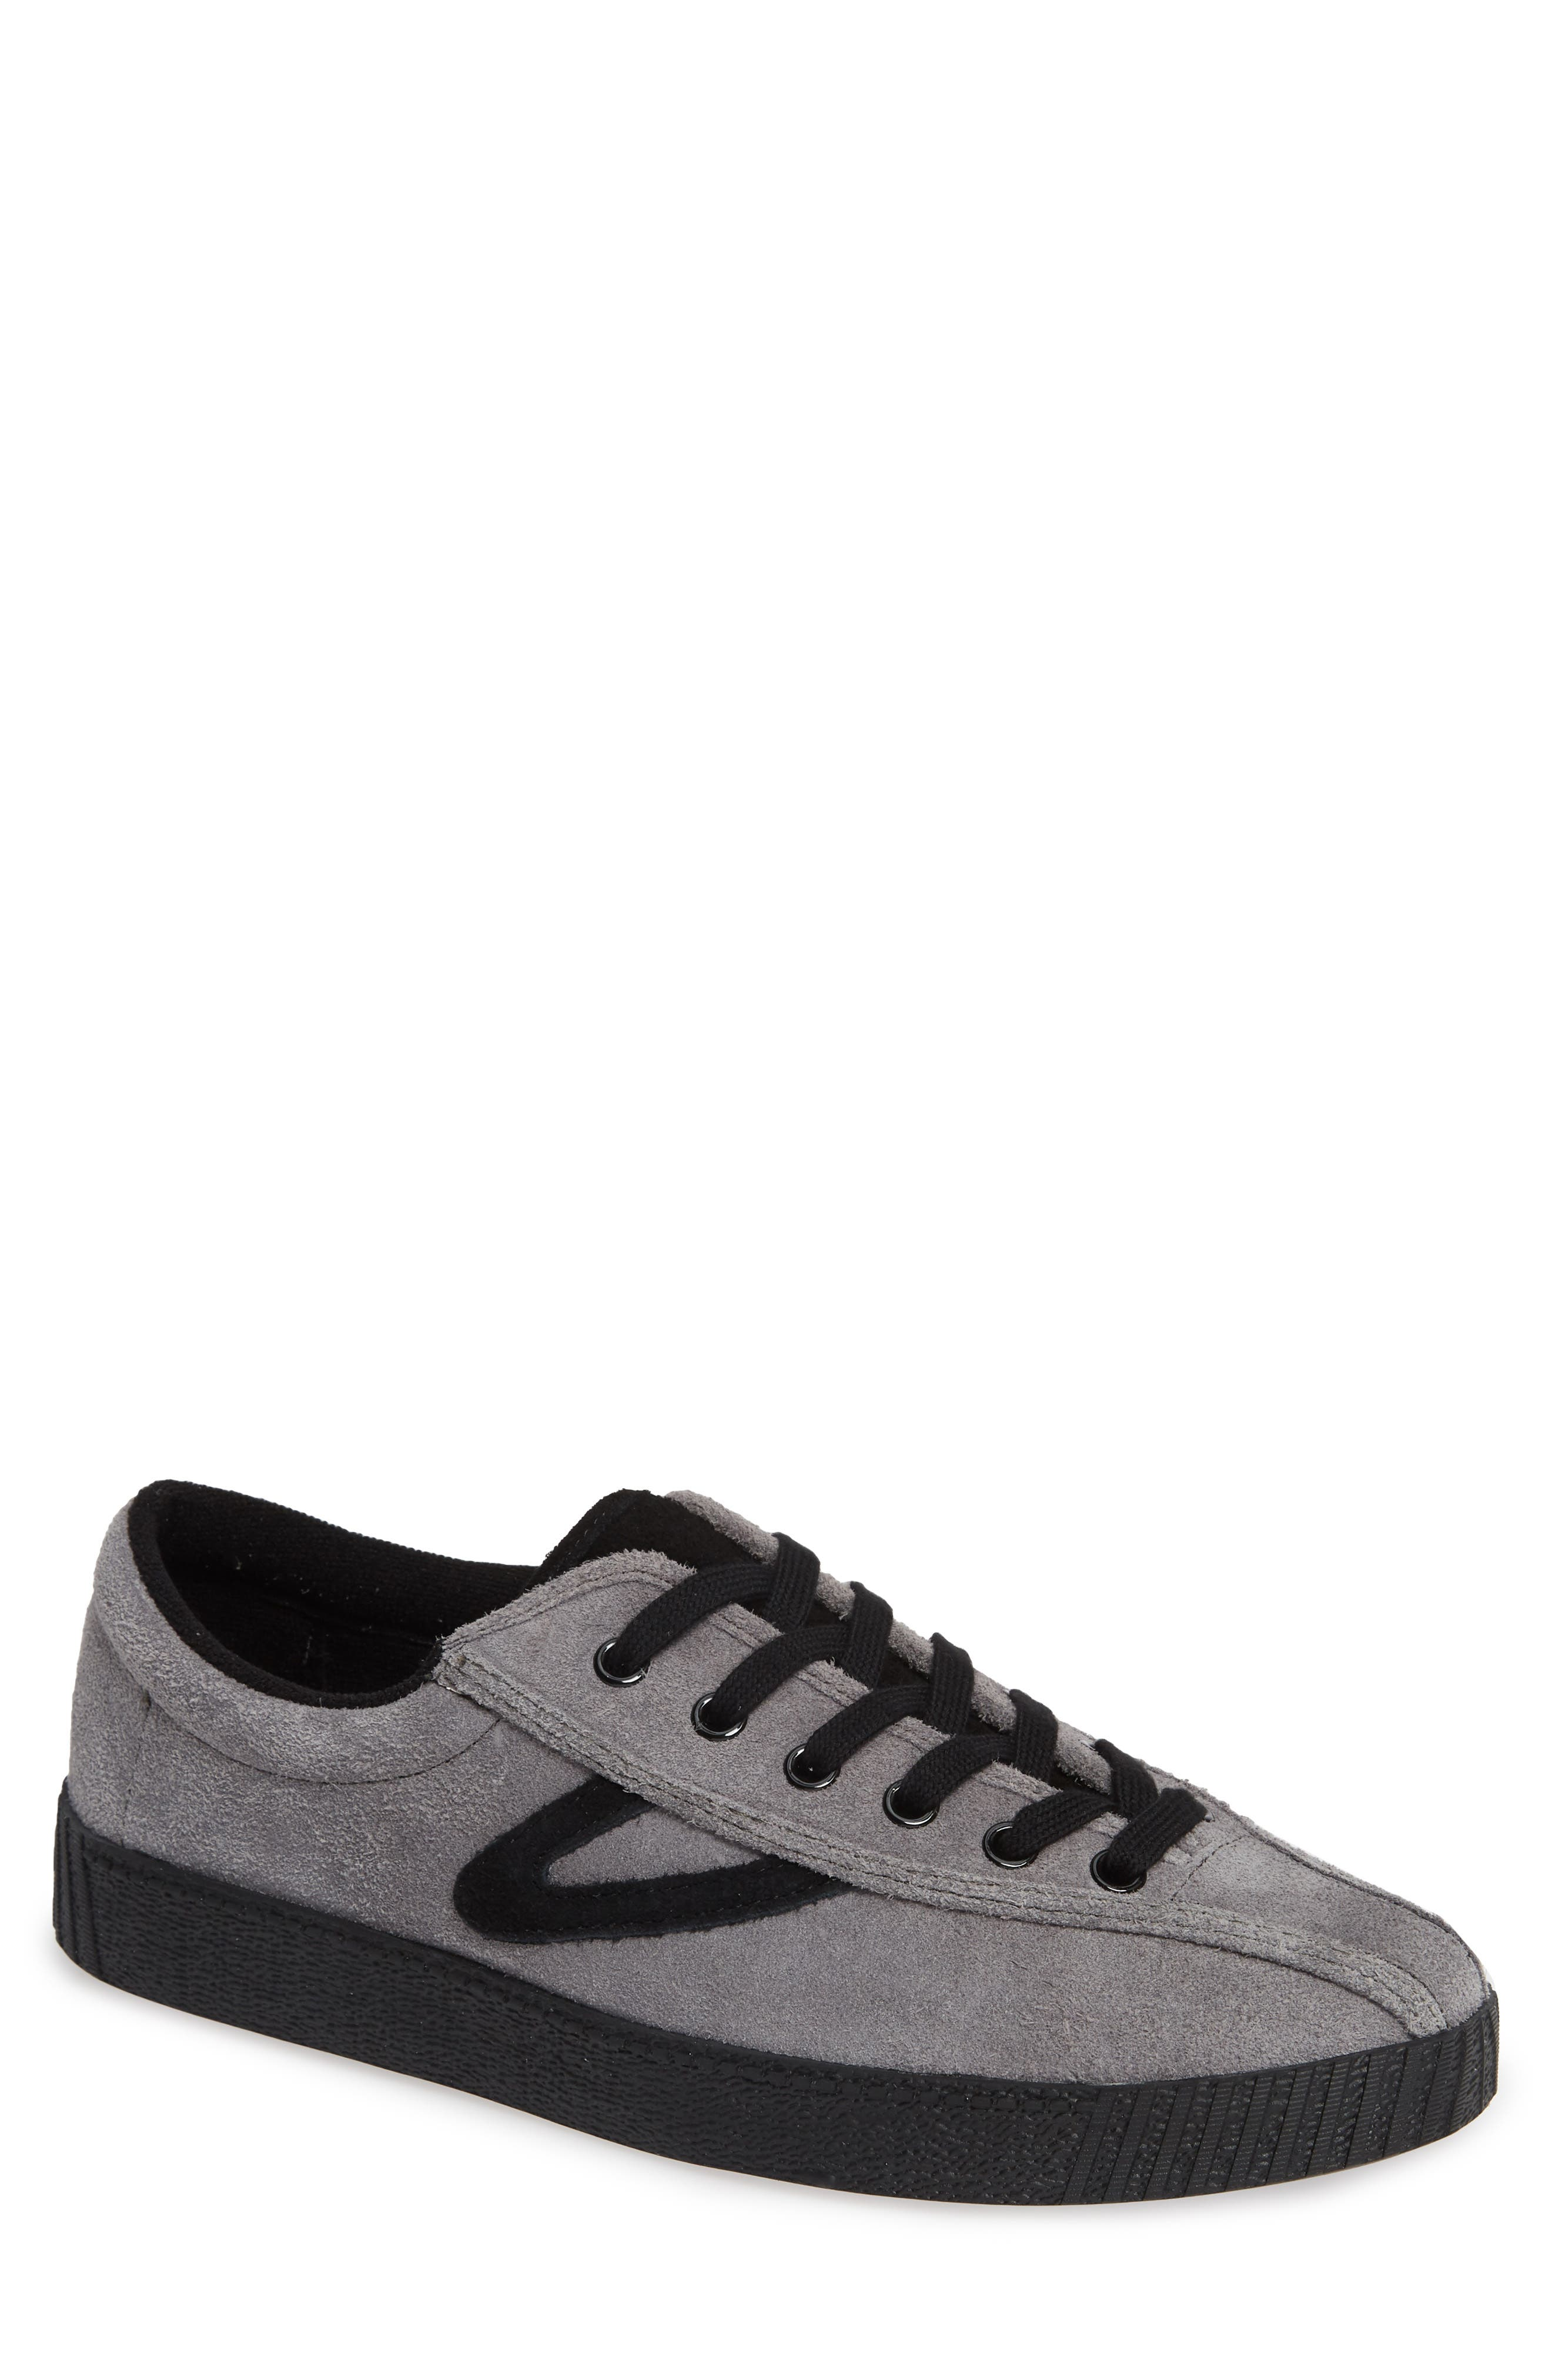 Nylite26Plus Sneaker,                         Main,                         color, GRAPHITE SUEDE